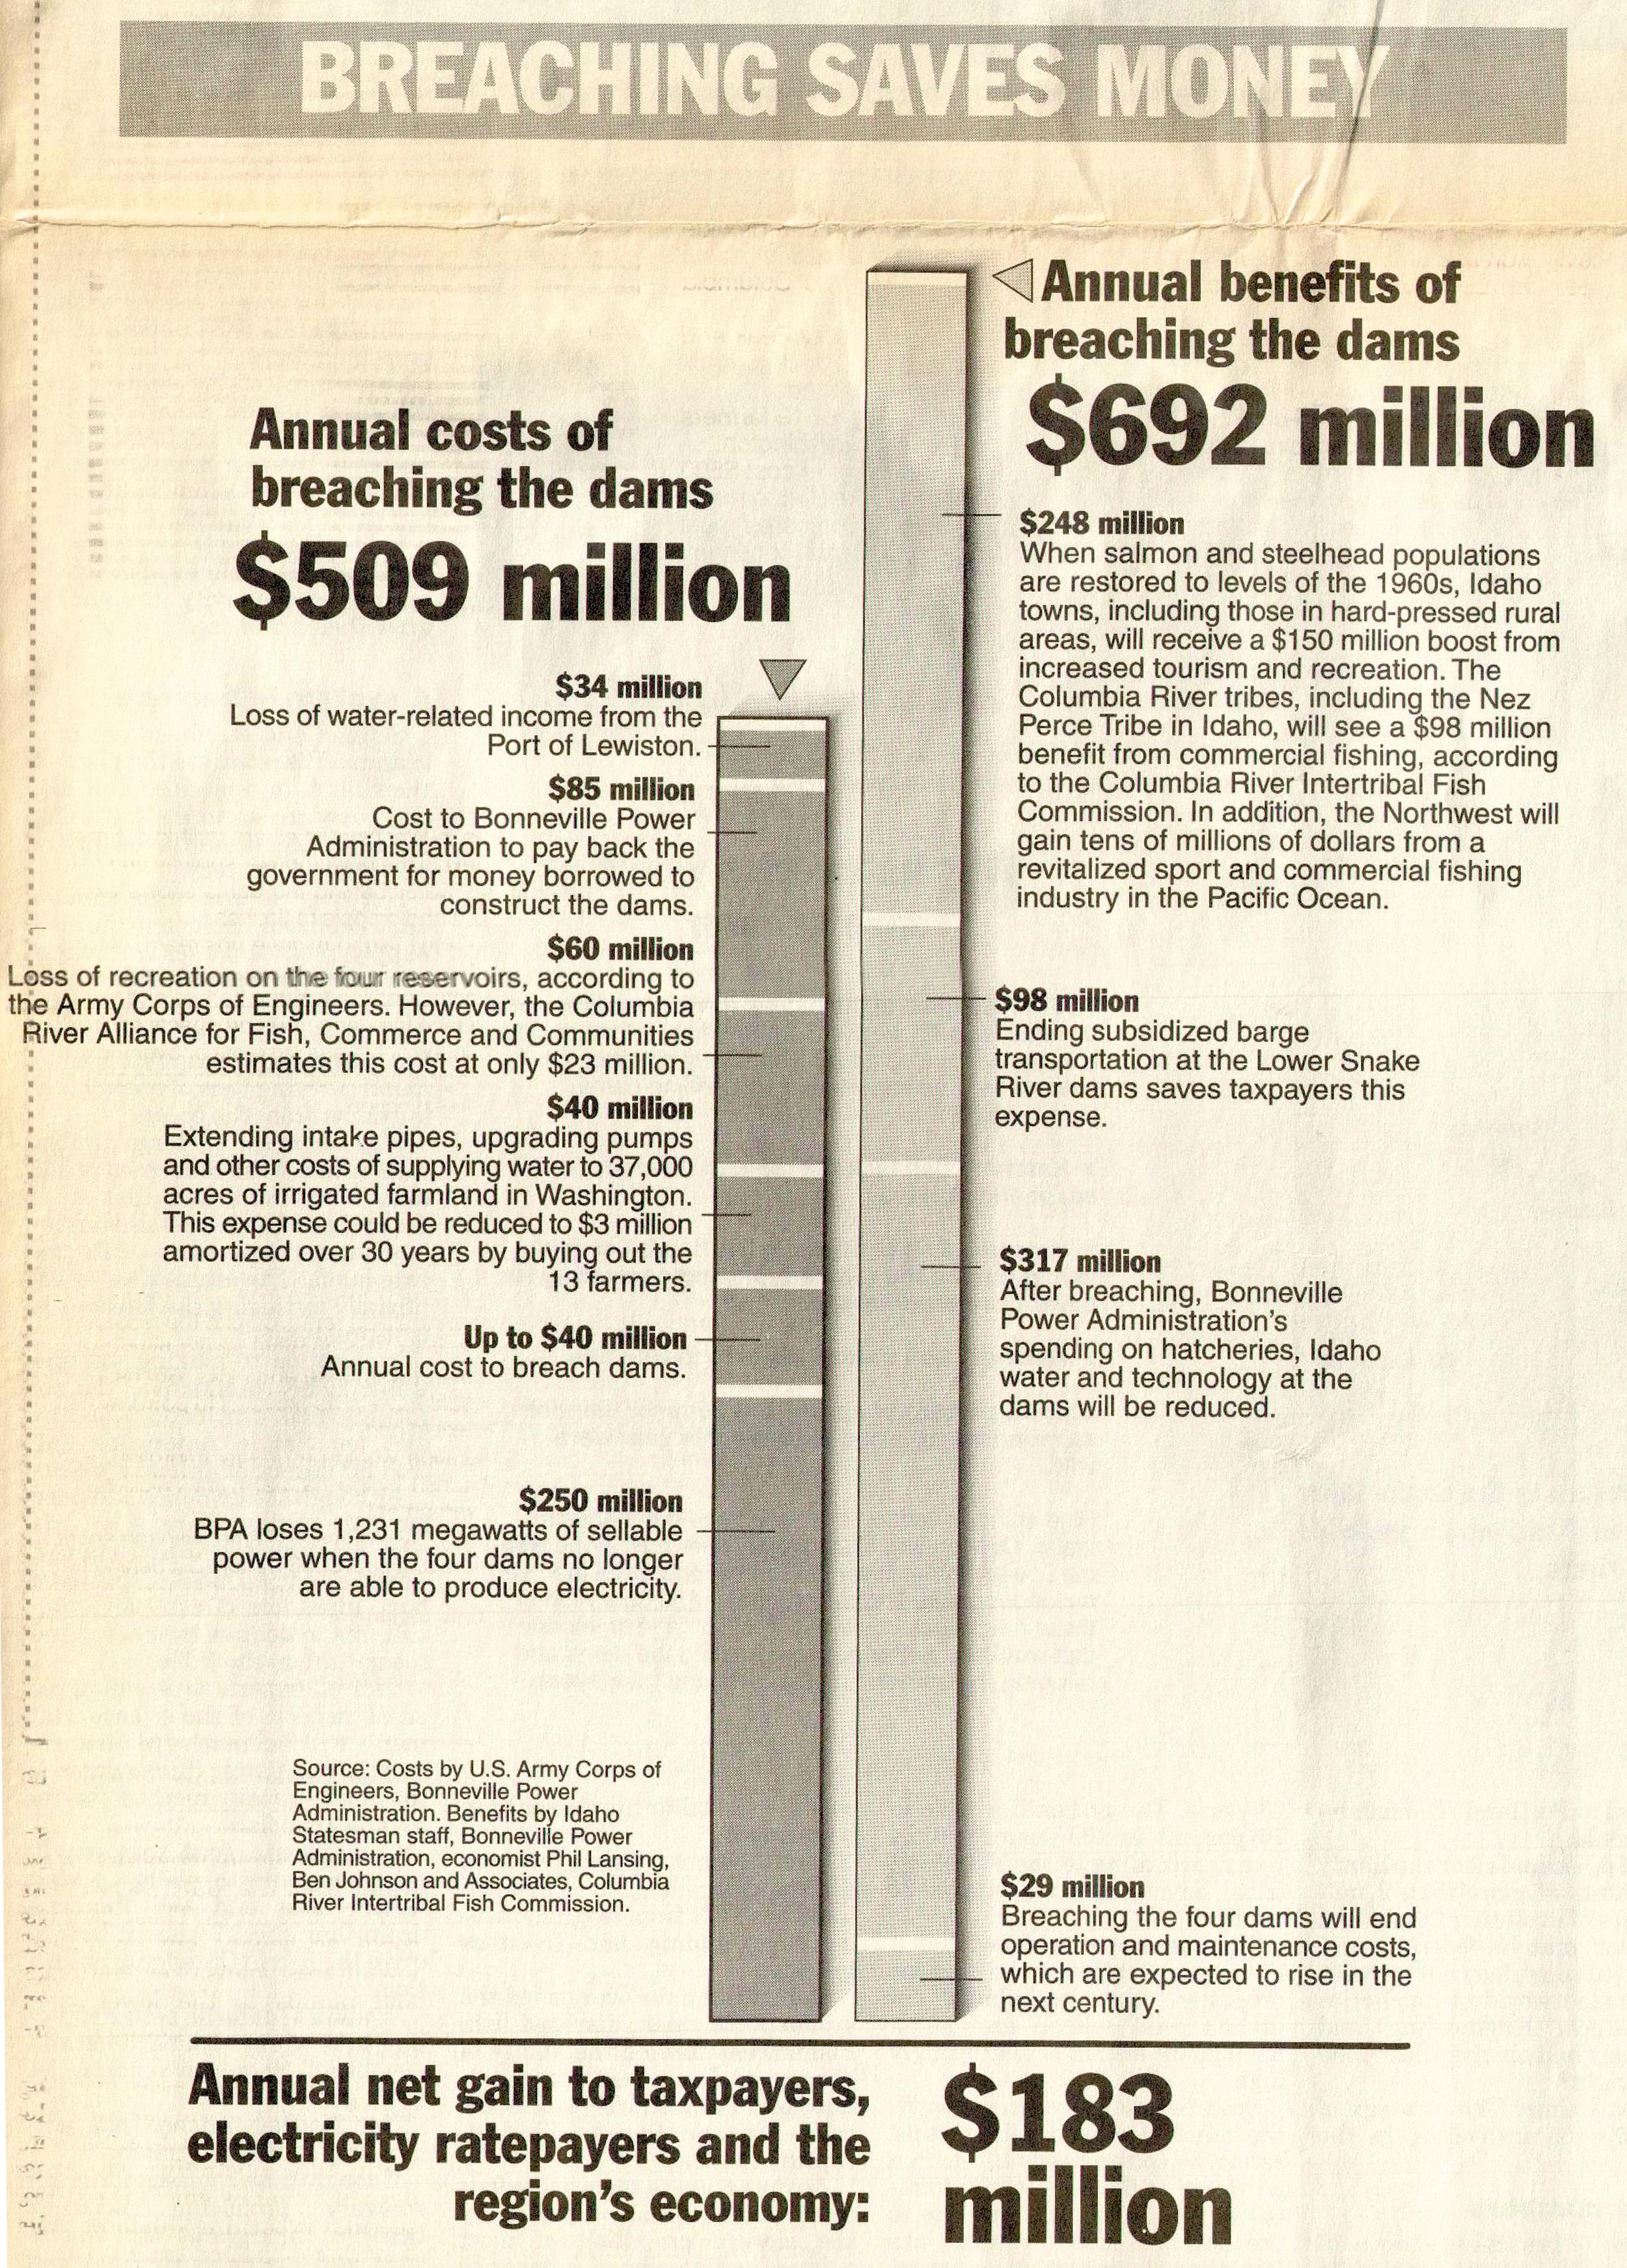 Graphic by The Idaho Statesman.